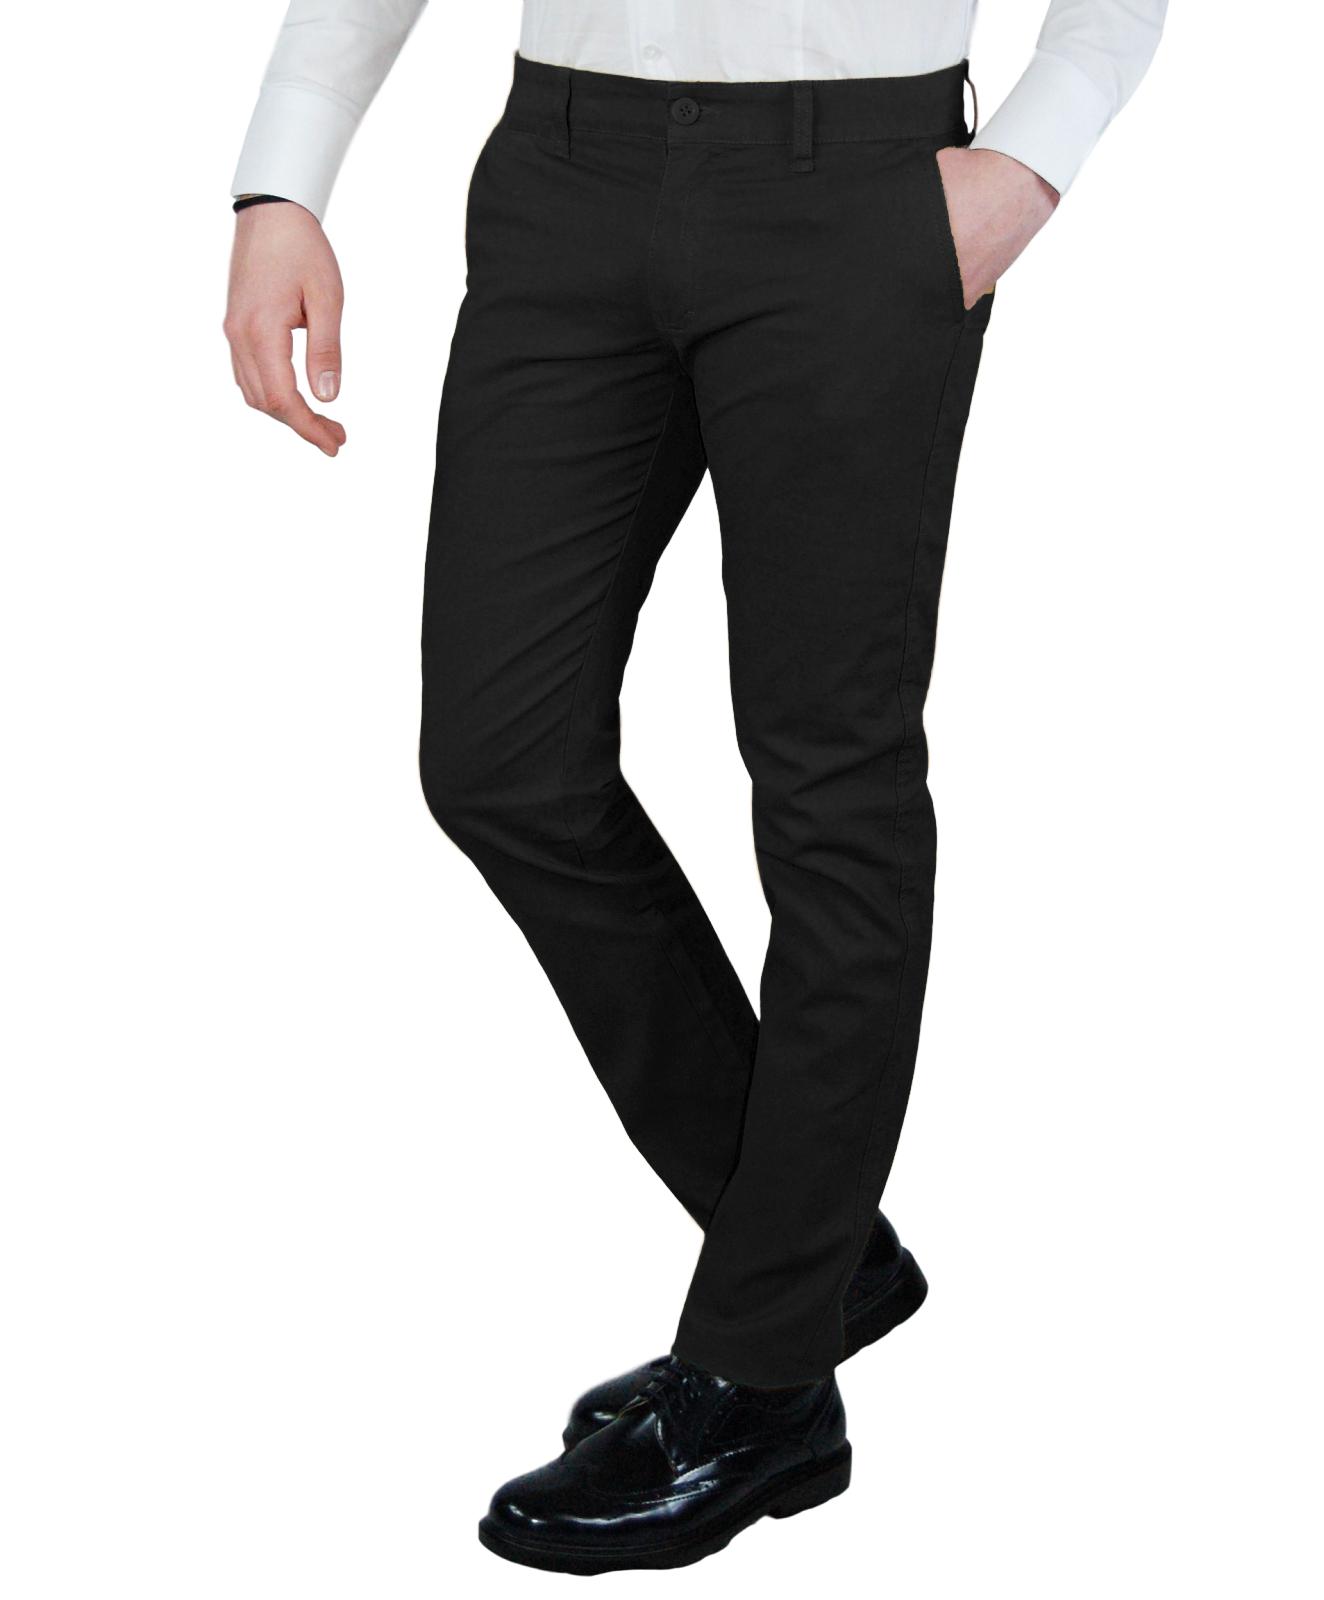 Pantalone-Uomo-Primaverile-Slim-Fit-Chino-tasca-america-Cotone-Blu-Nero-Verde miniatura 16